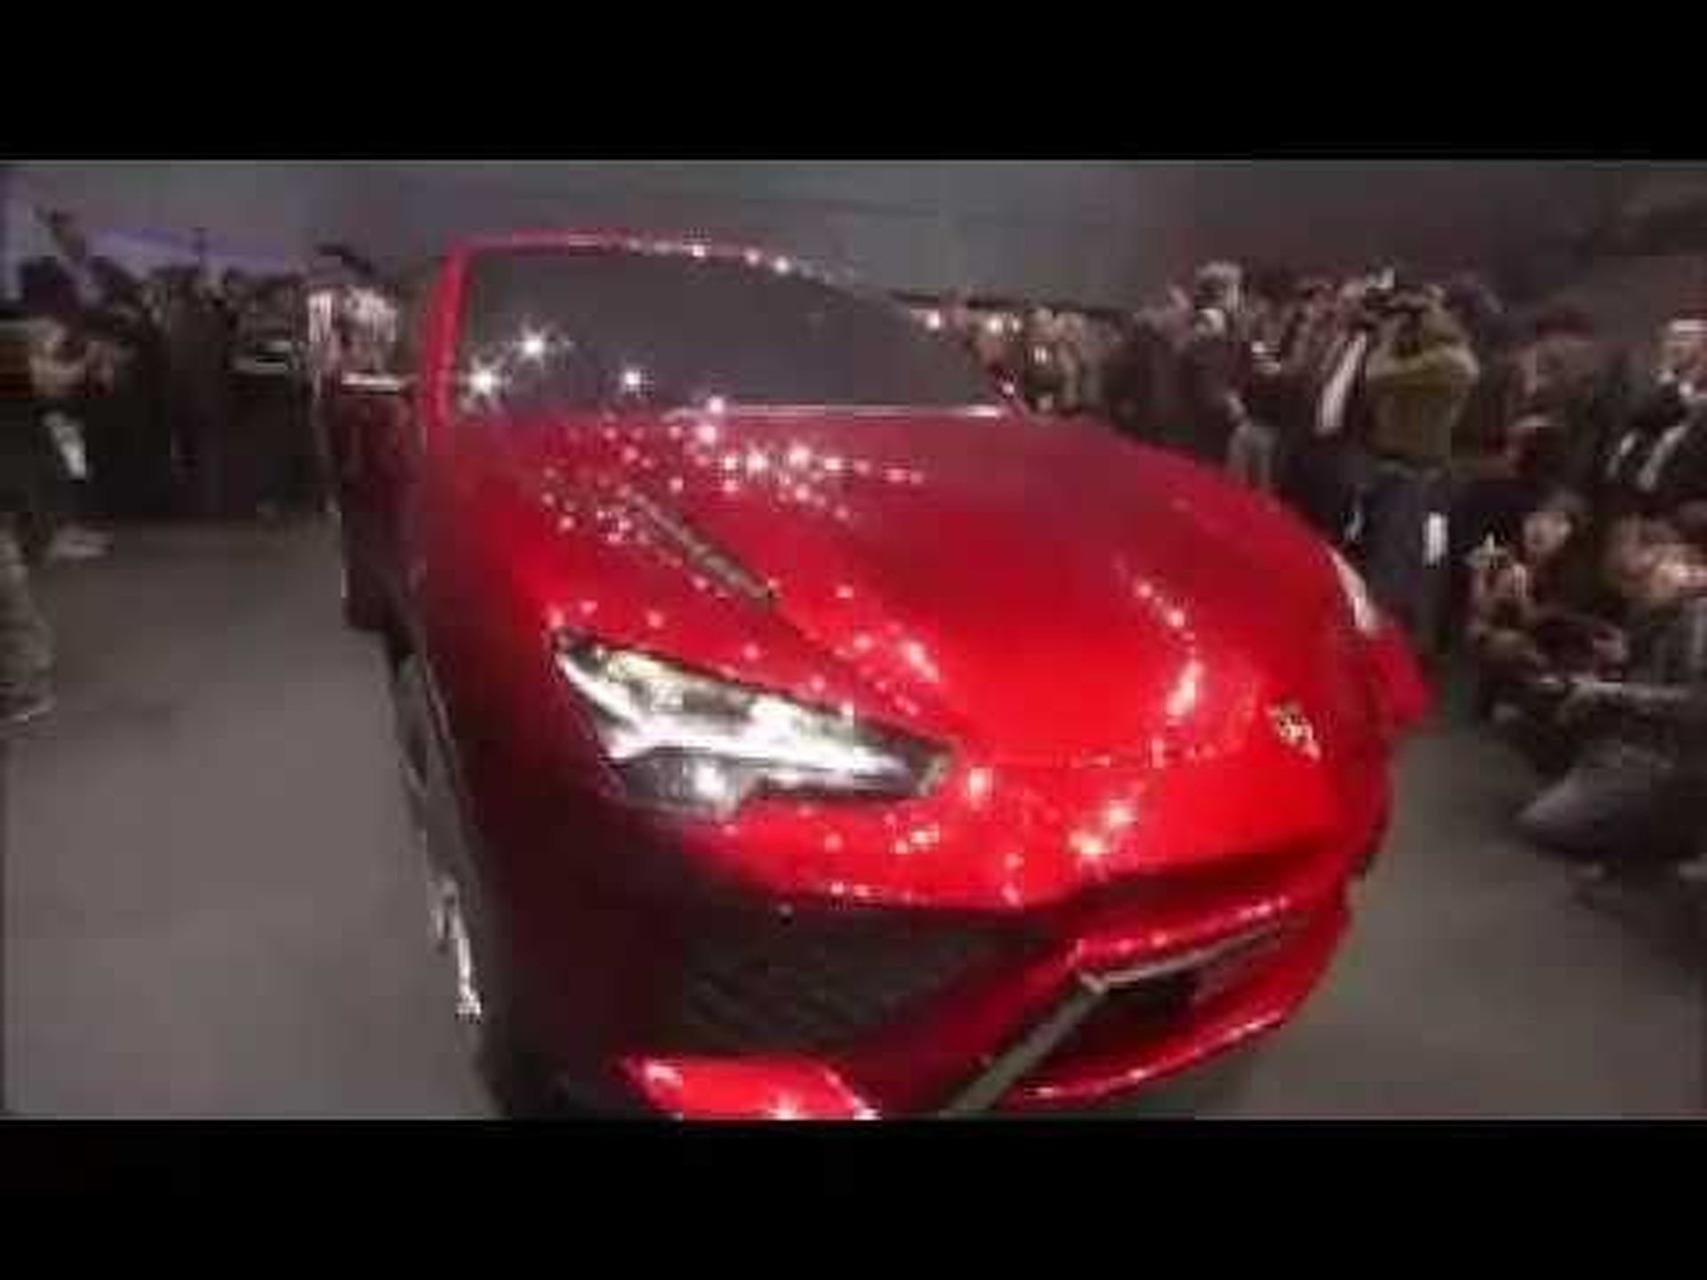 2012 Lamborghini Urus Concept General Views at the 2012 Beijing Motor Show